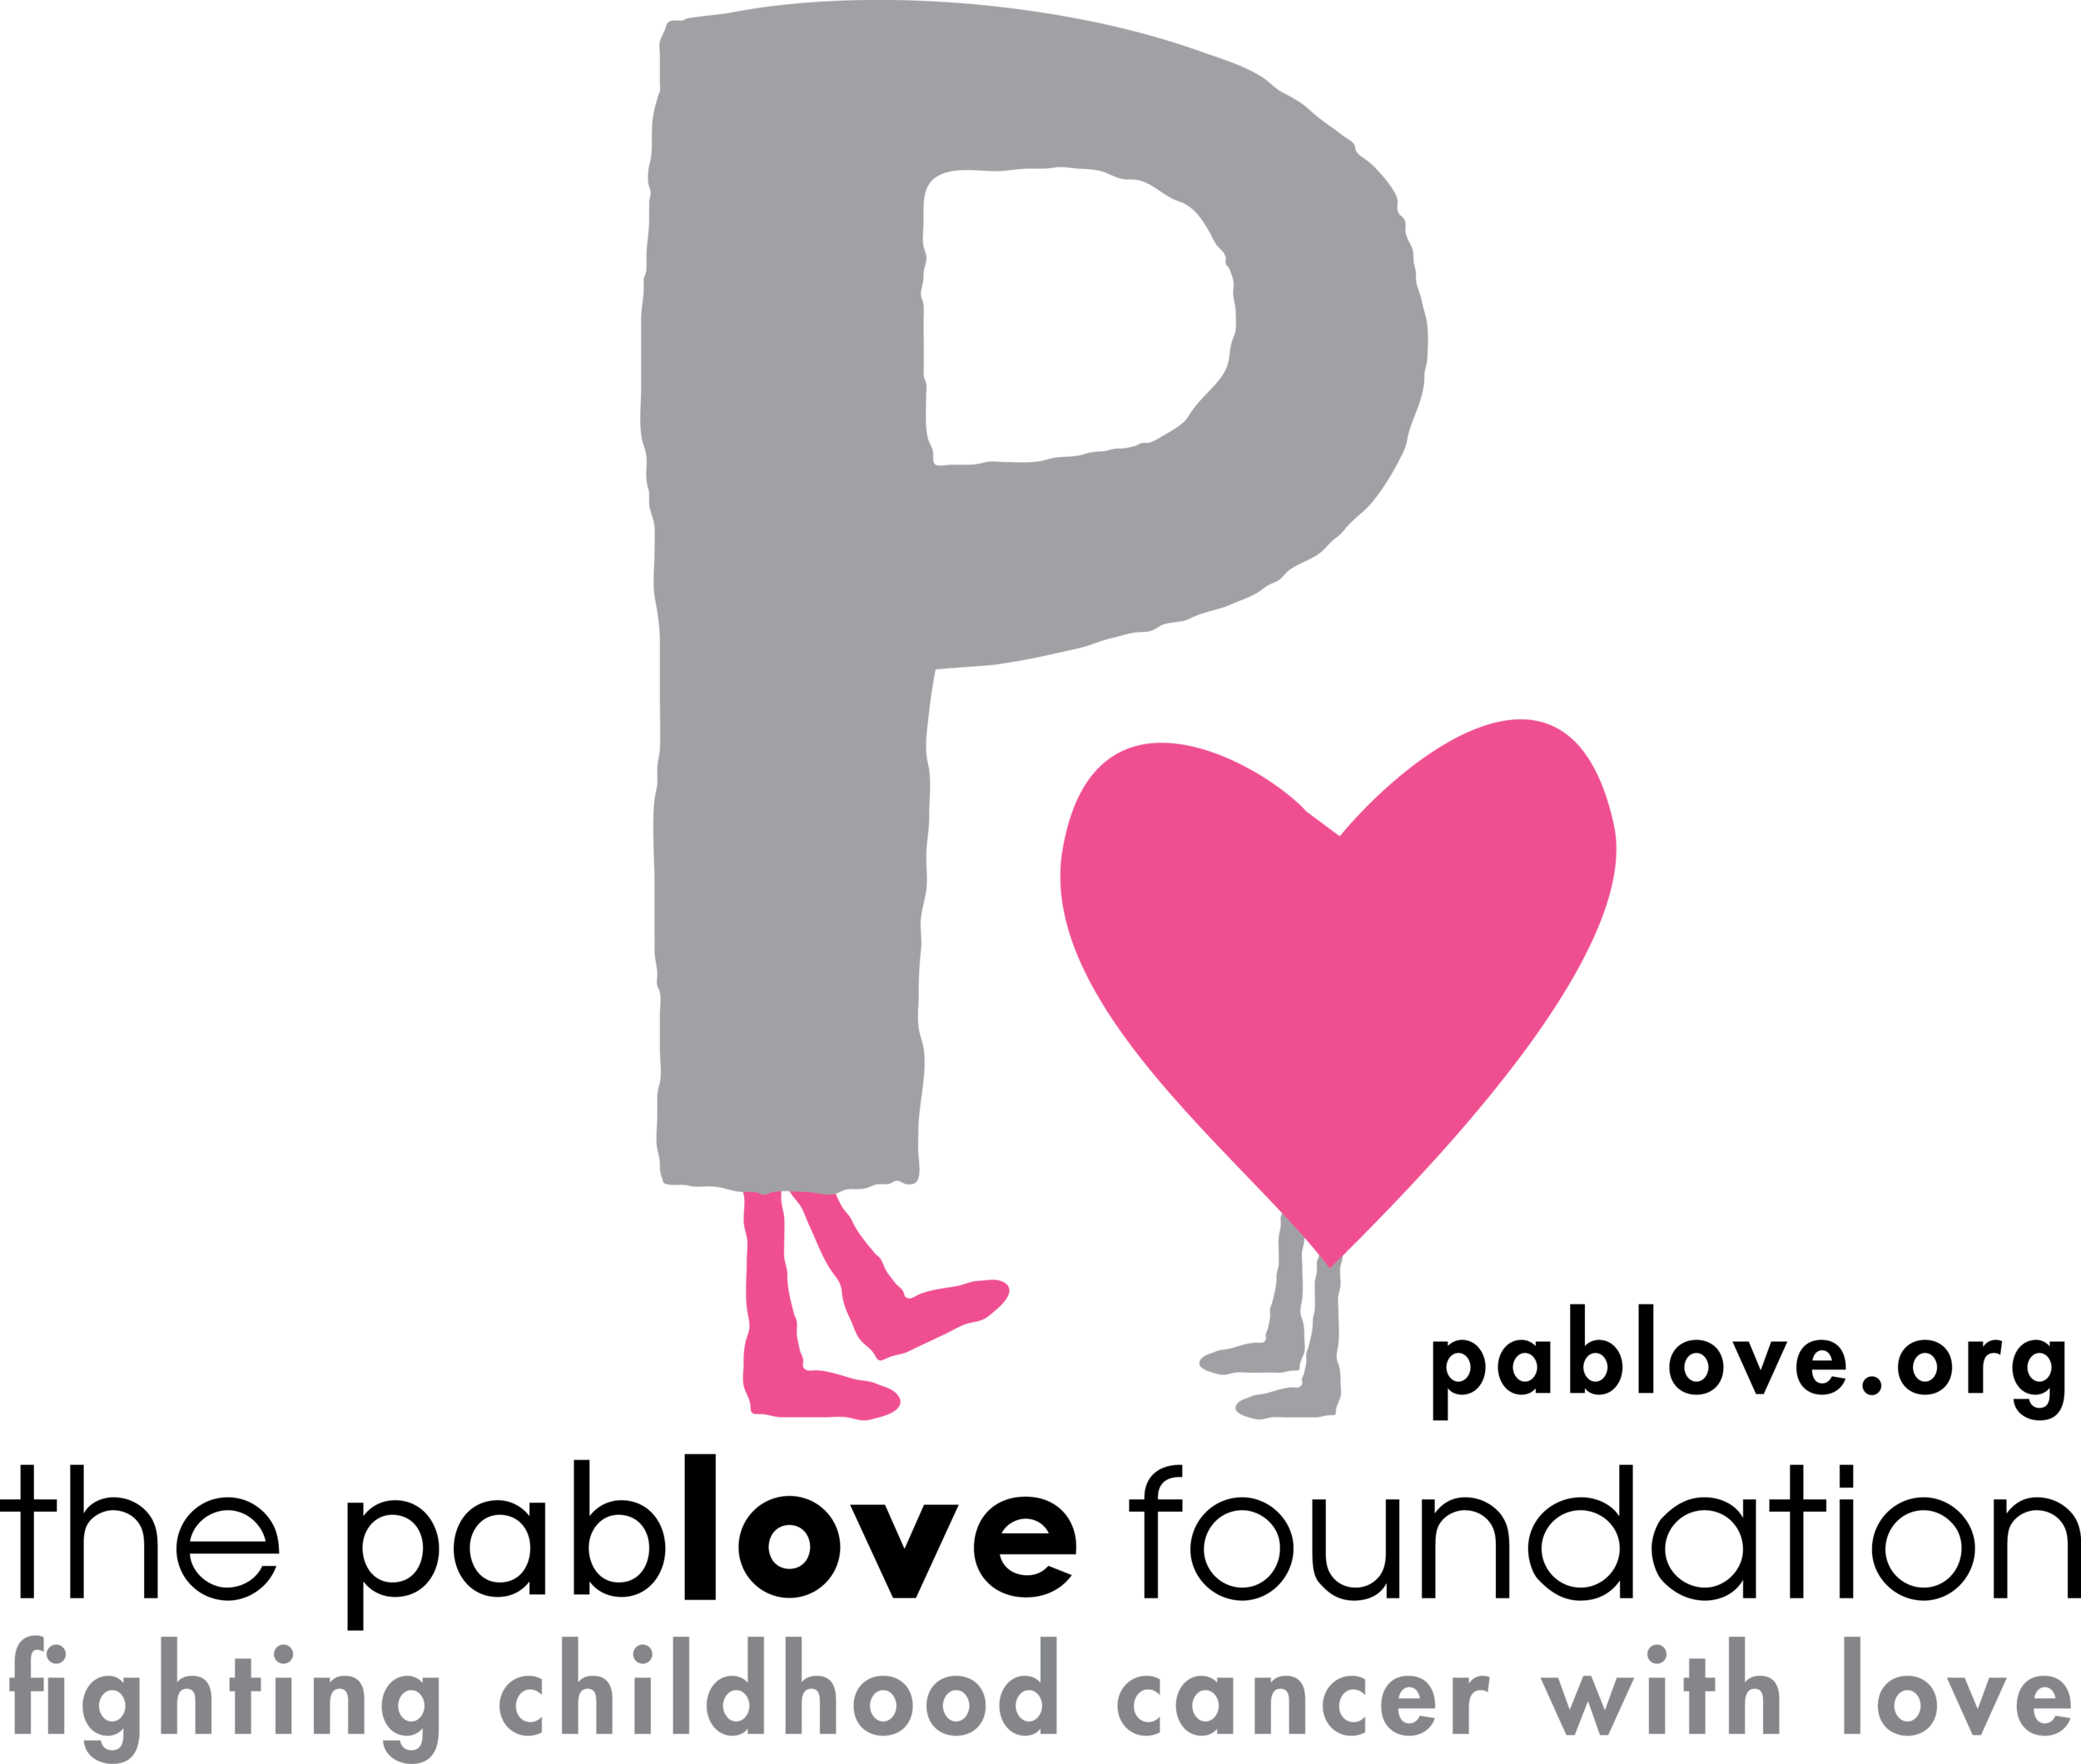 PABLOVE_logo (5).png